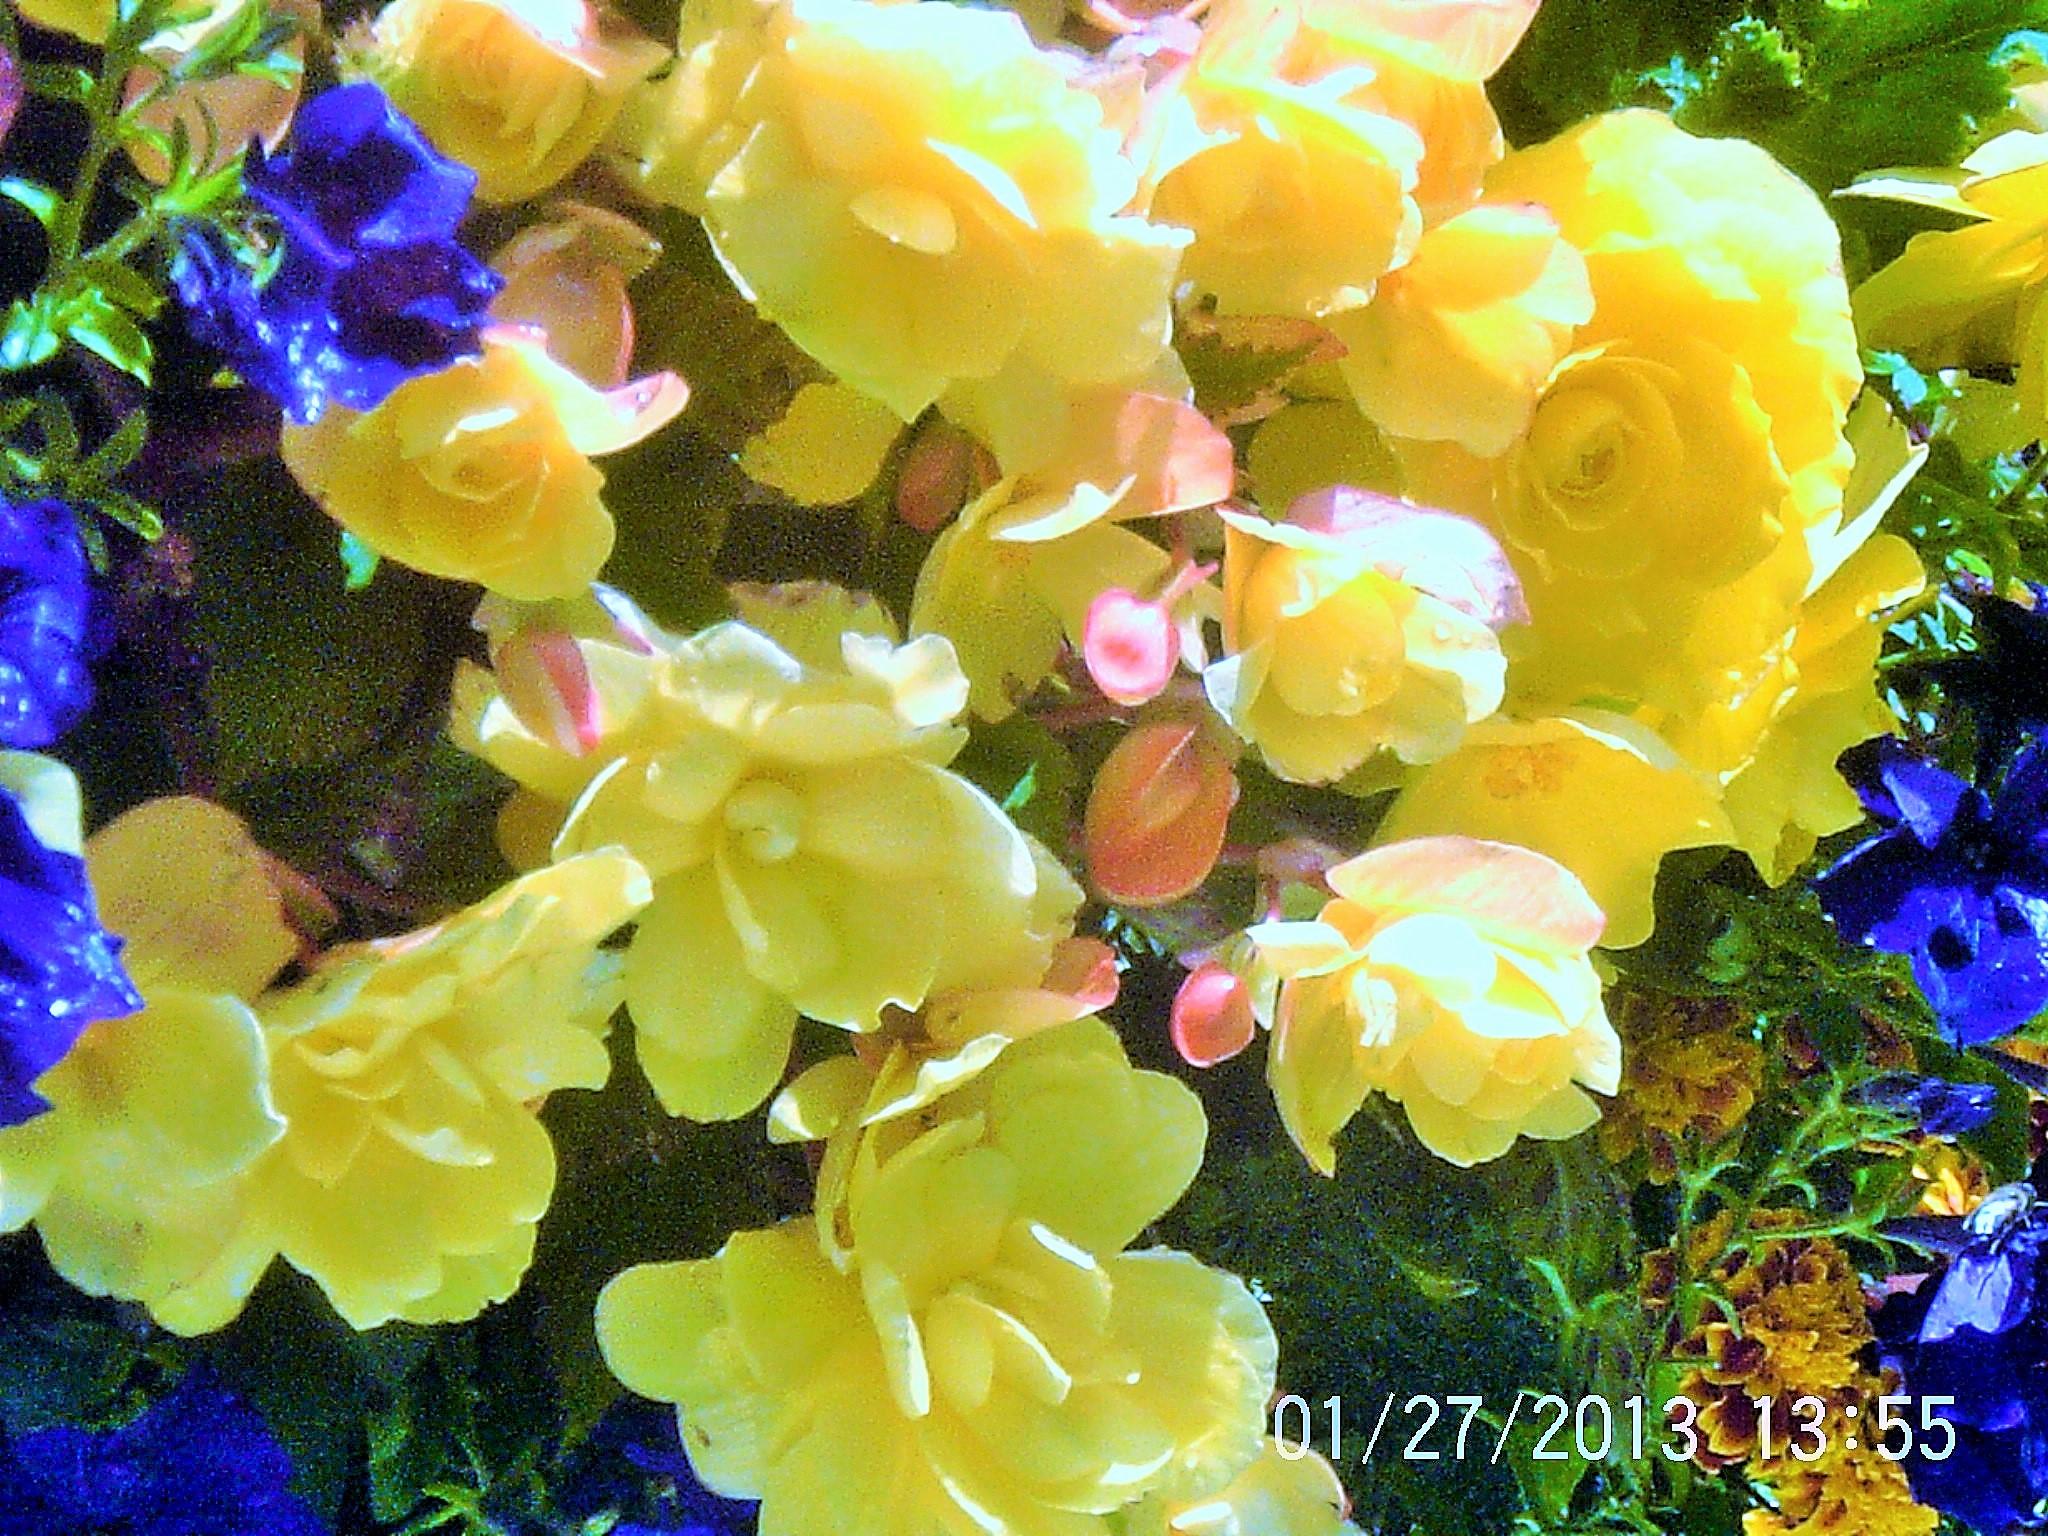 Flowers in my garden last summer